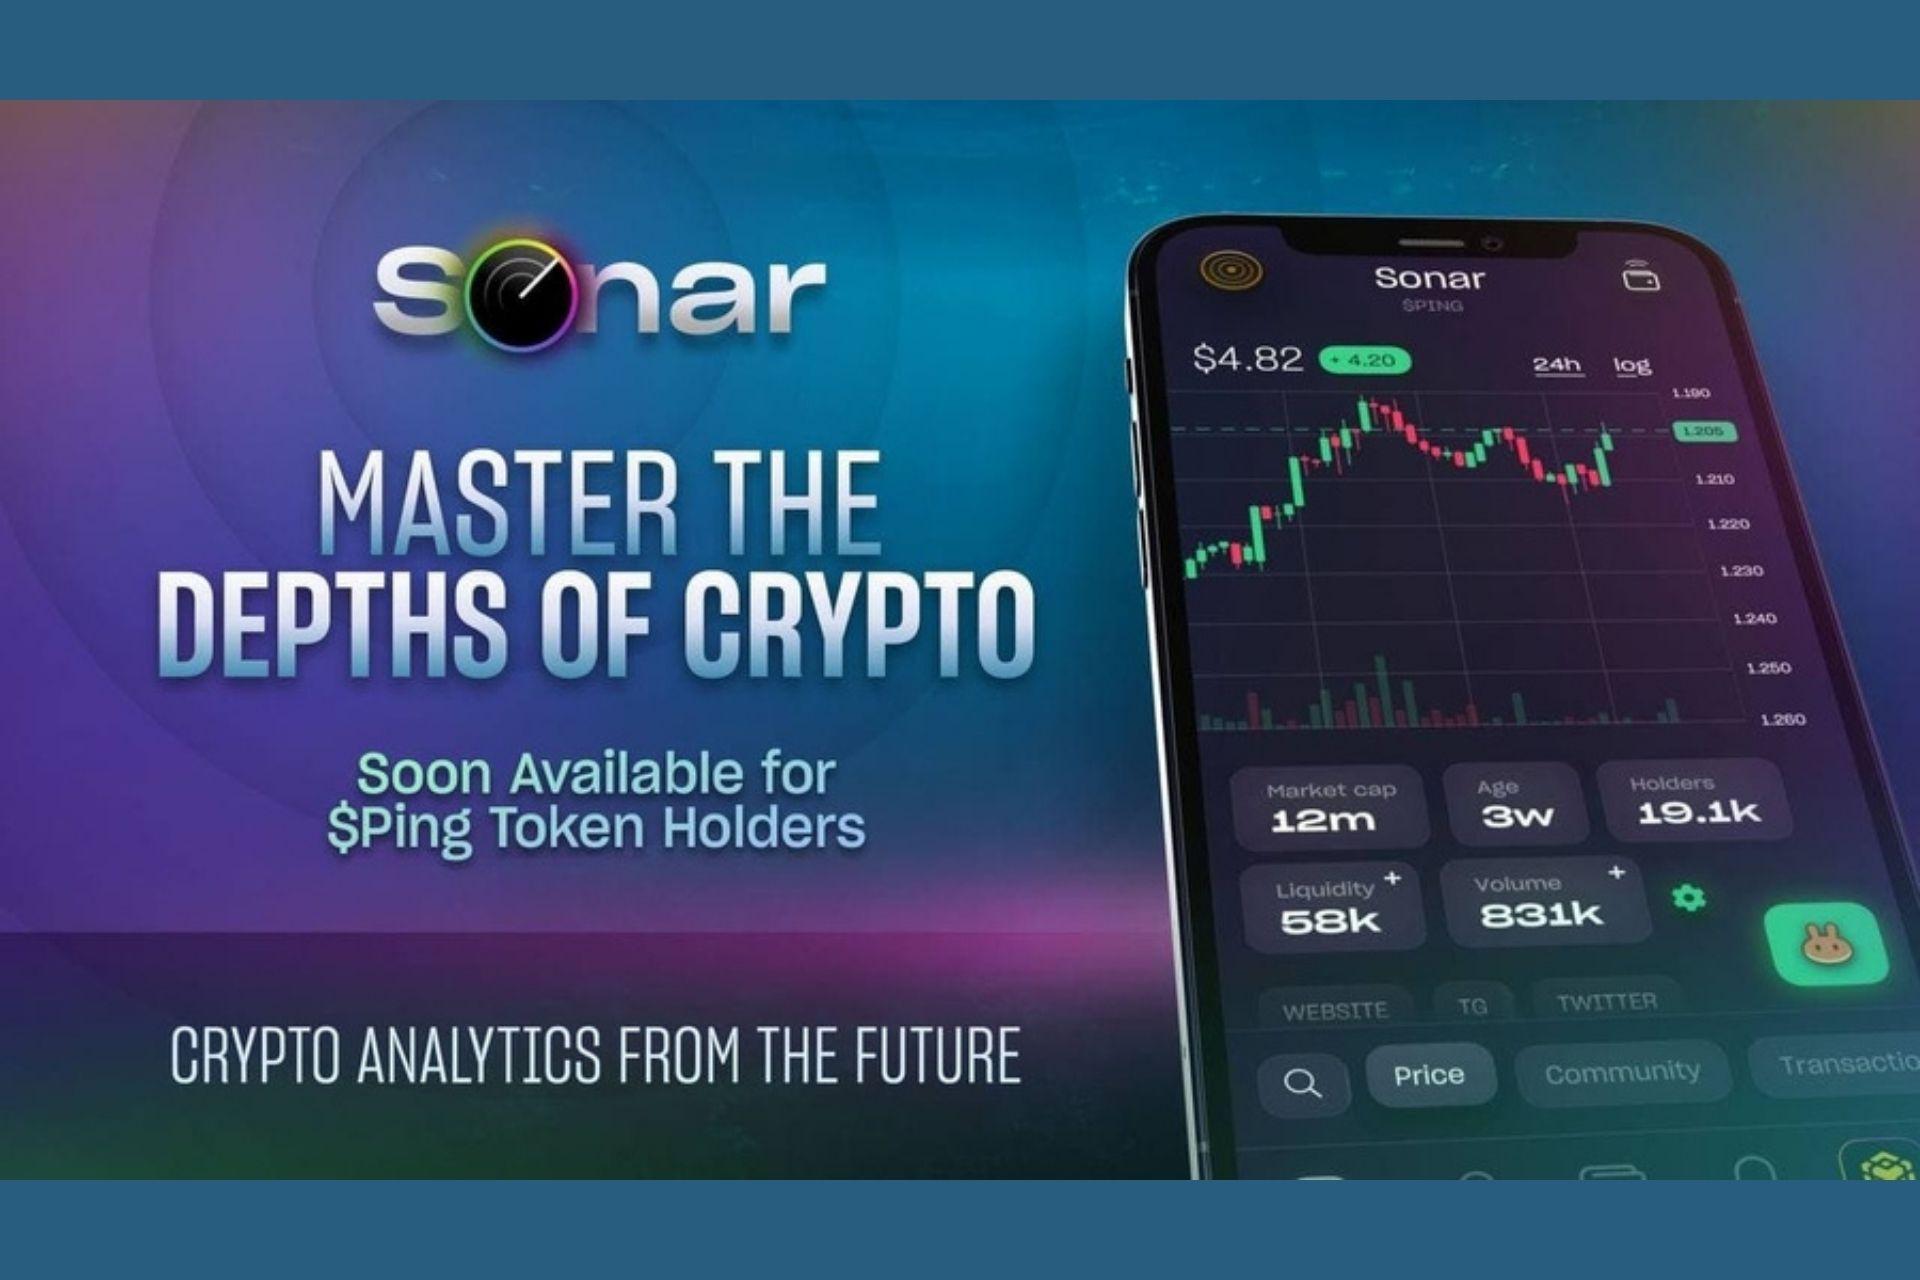 Sonar | The PING Heard Around The World